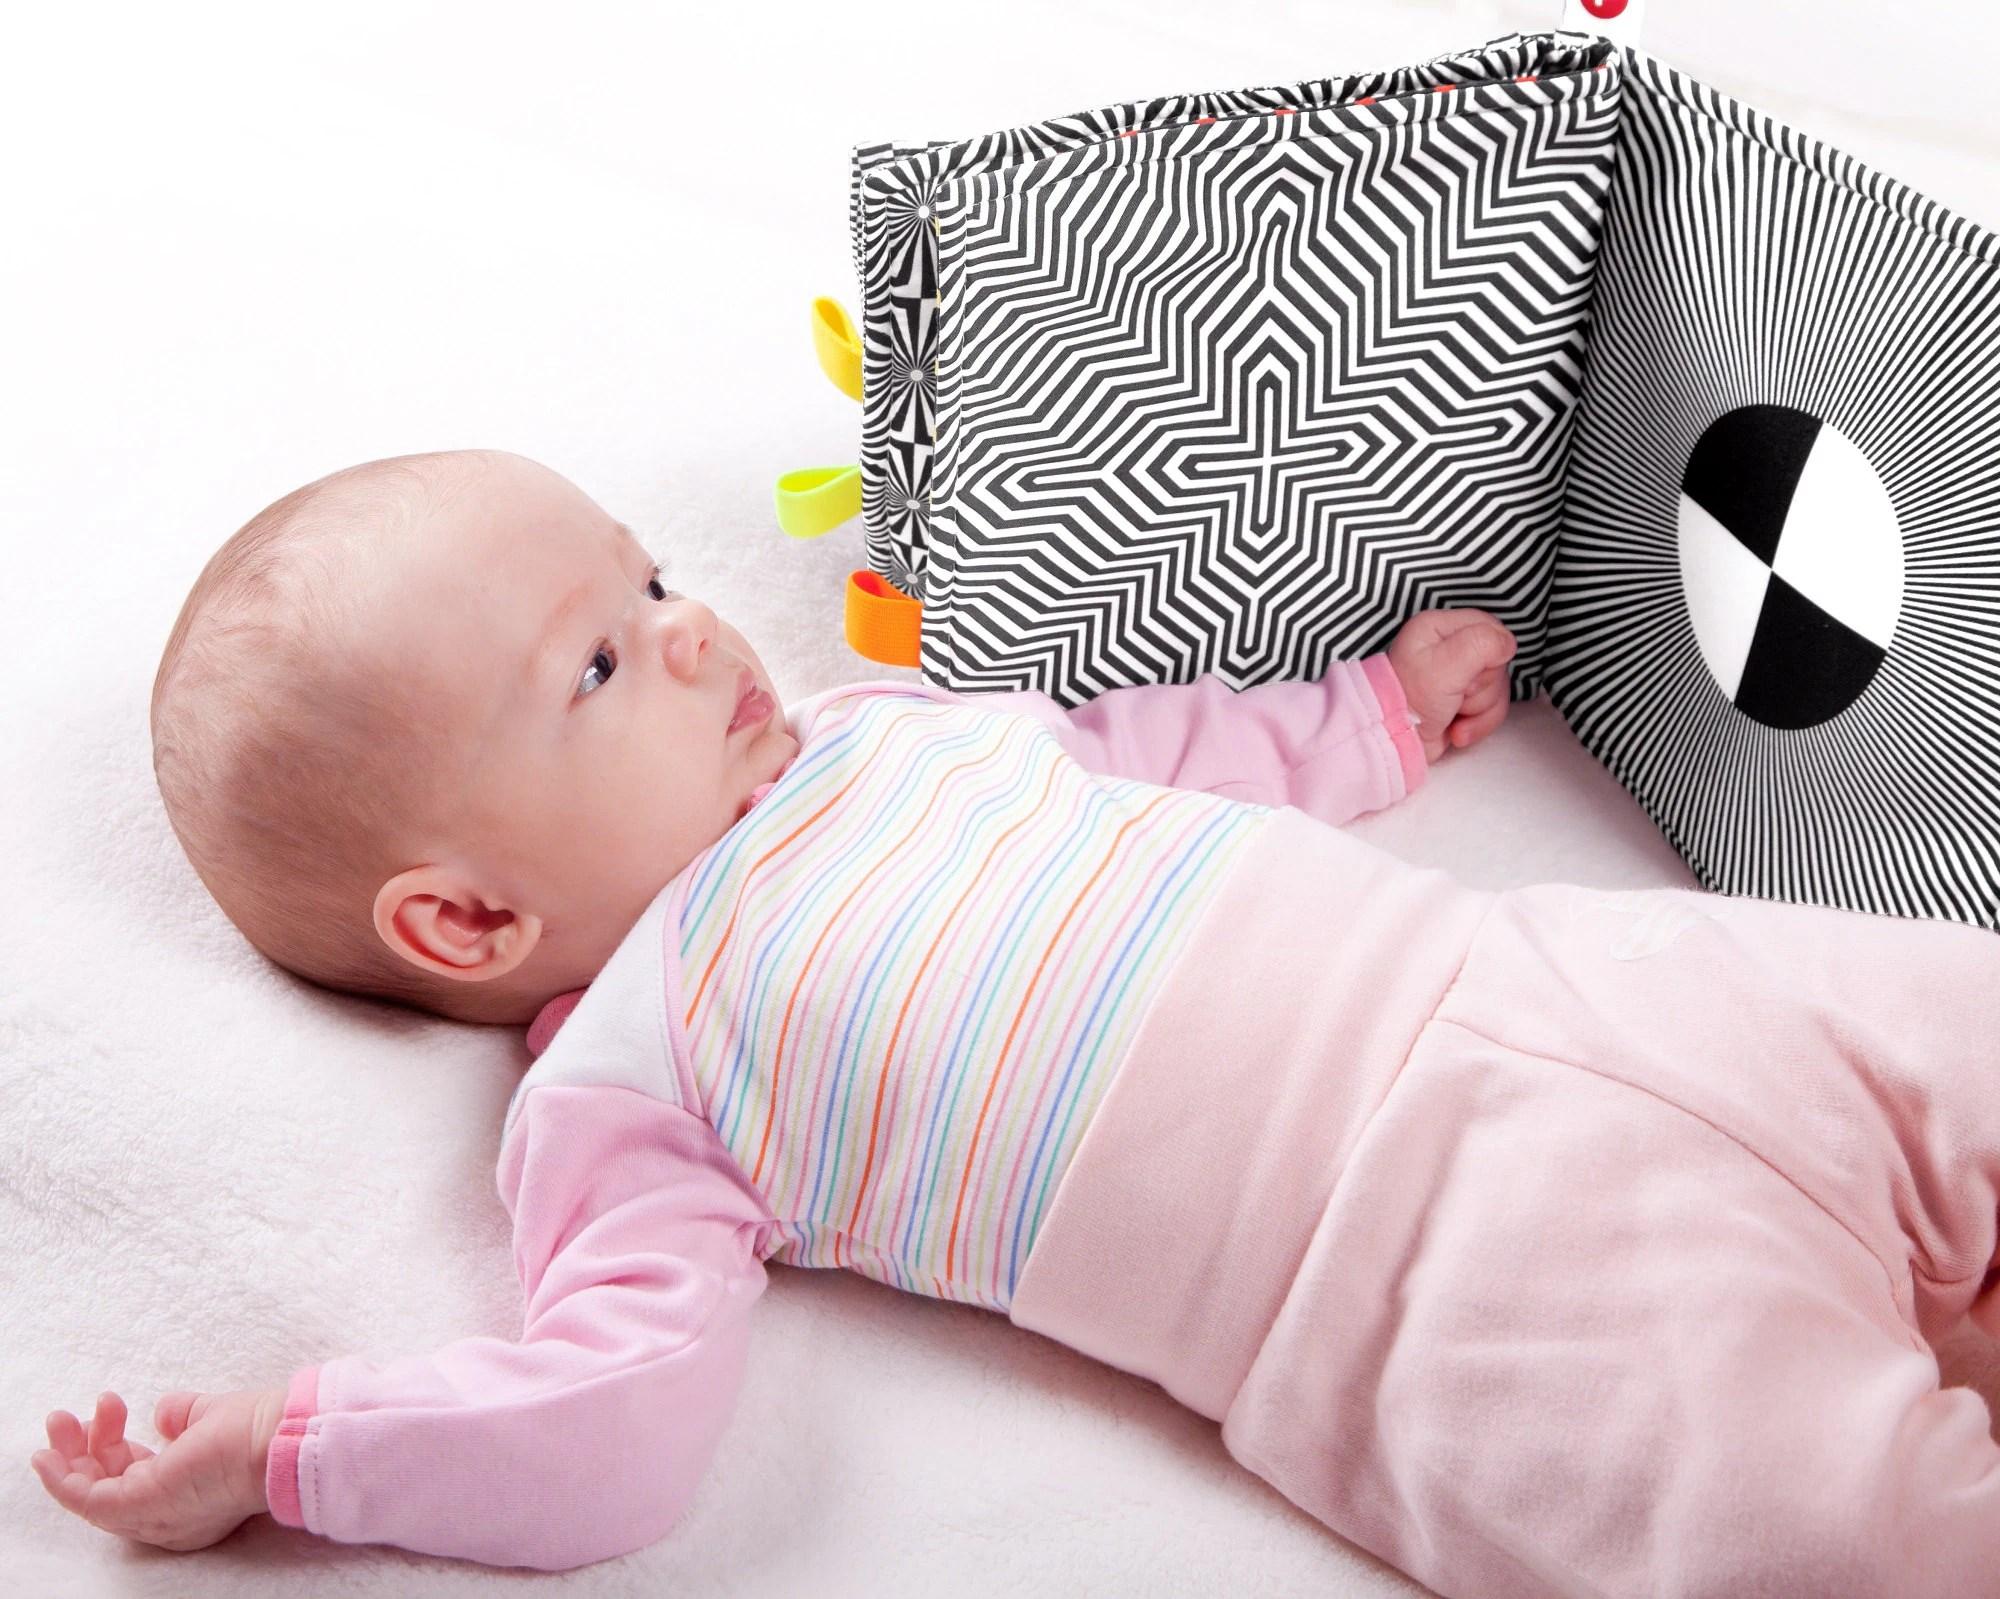 SENSORY BOOK BABY High Contrast Baby Newborn Gift Cloth image 1